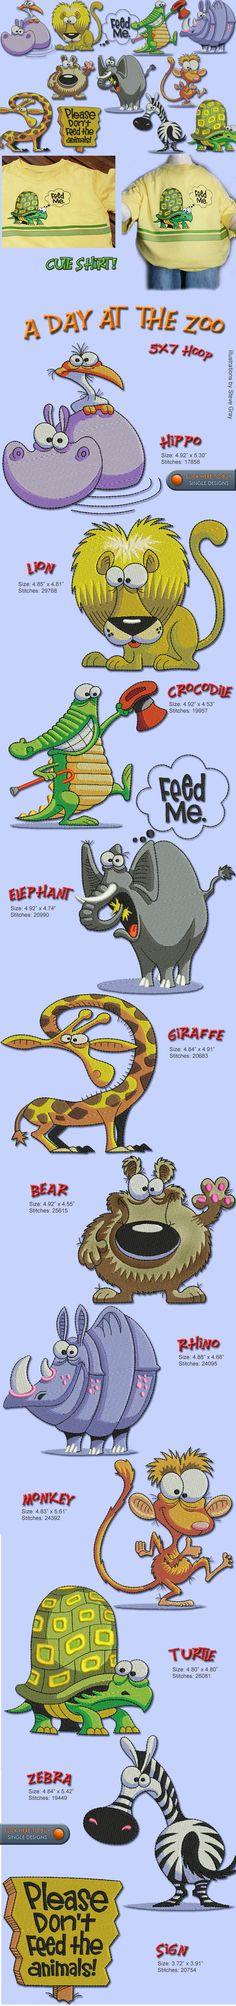 ANIMAL,ZOO,ELEPHANT,MONKEY,LION,RHINO,HIPPO,ZEBRA,TURTLE, Embroidery Designs Free Embroidery Design Patterns Applique